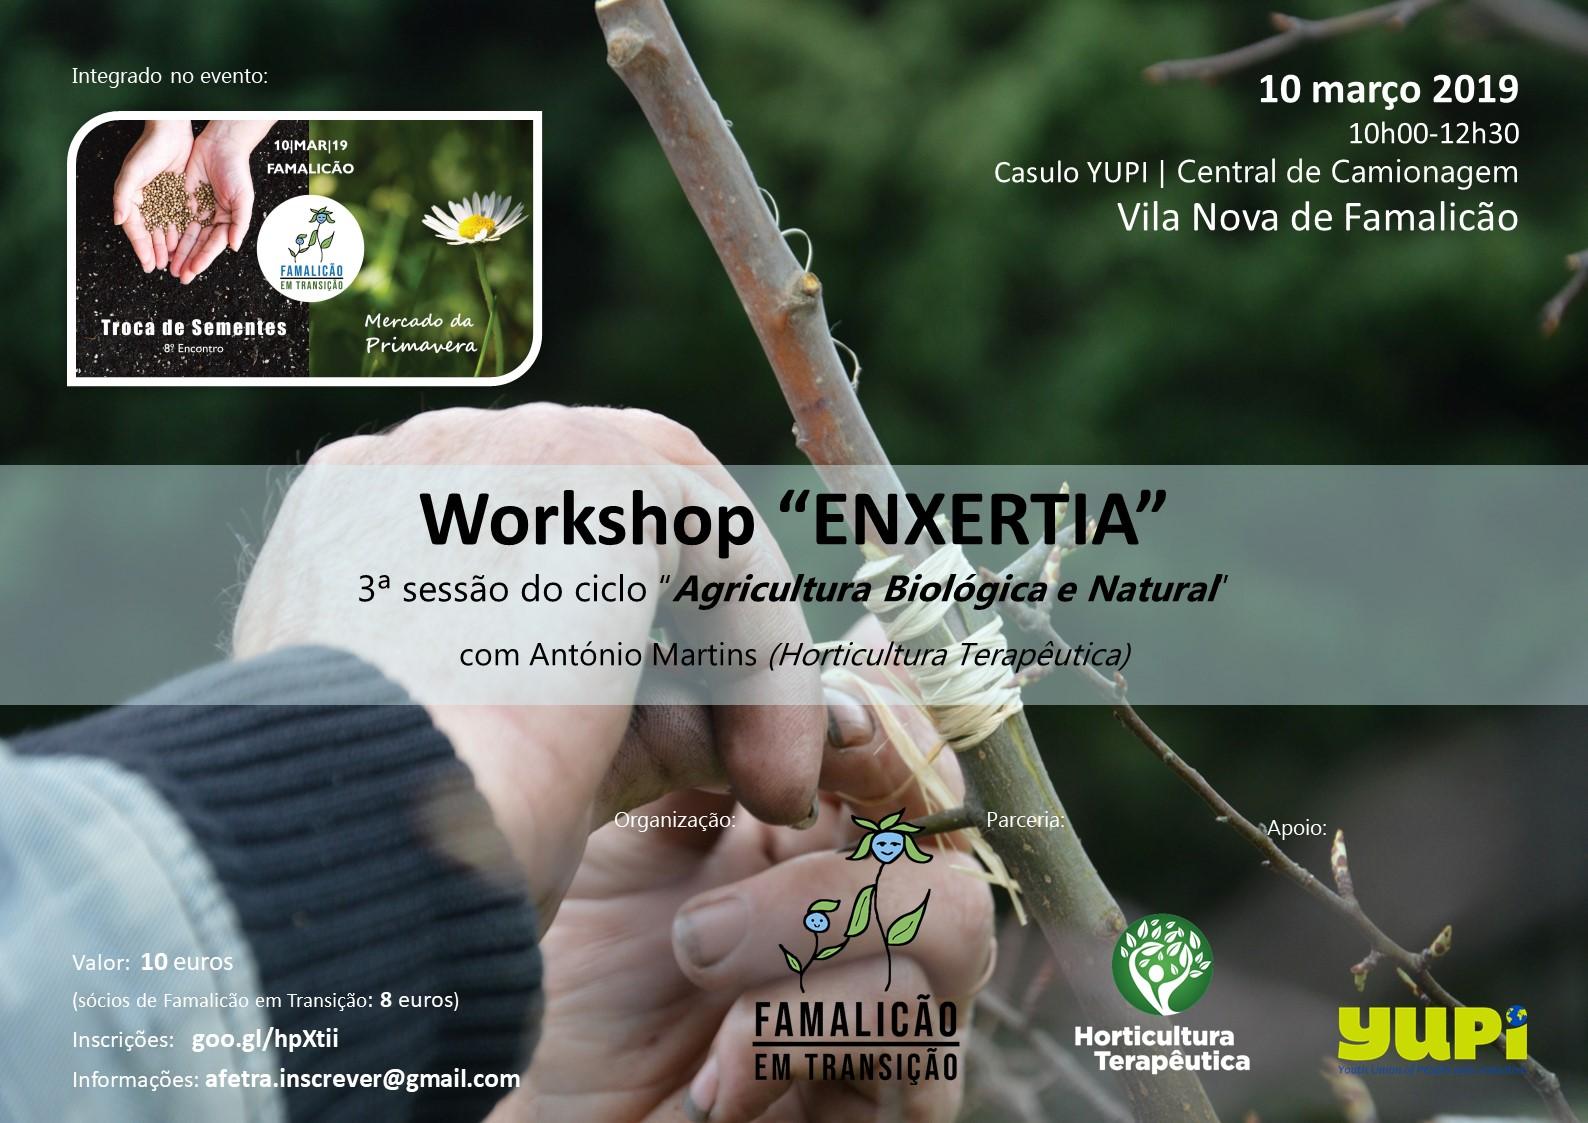 Workshop Enxertia - 10 março